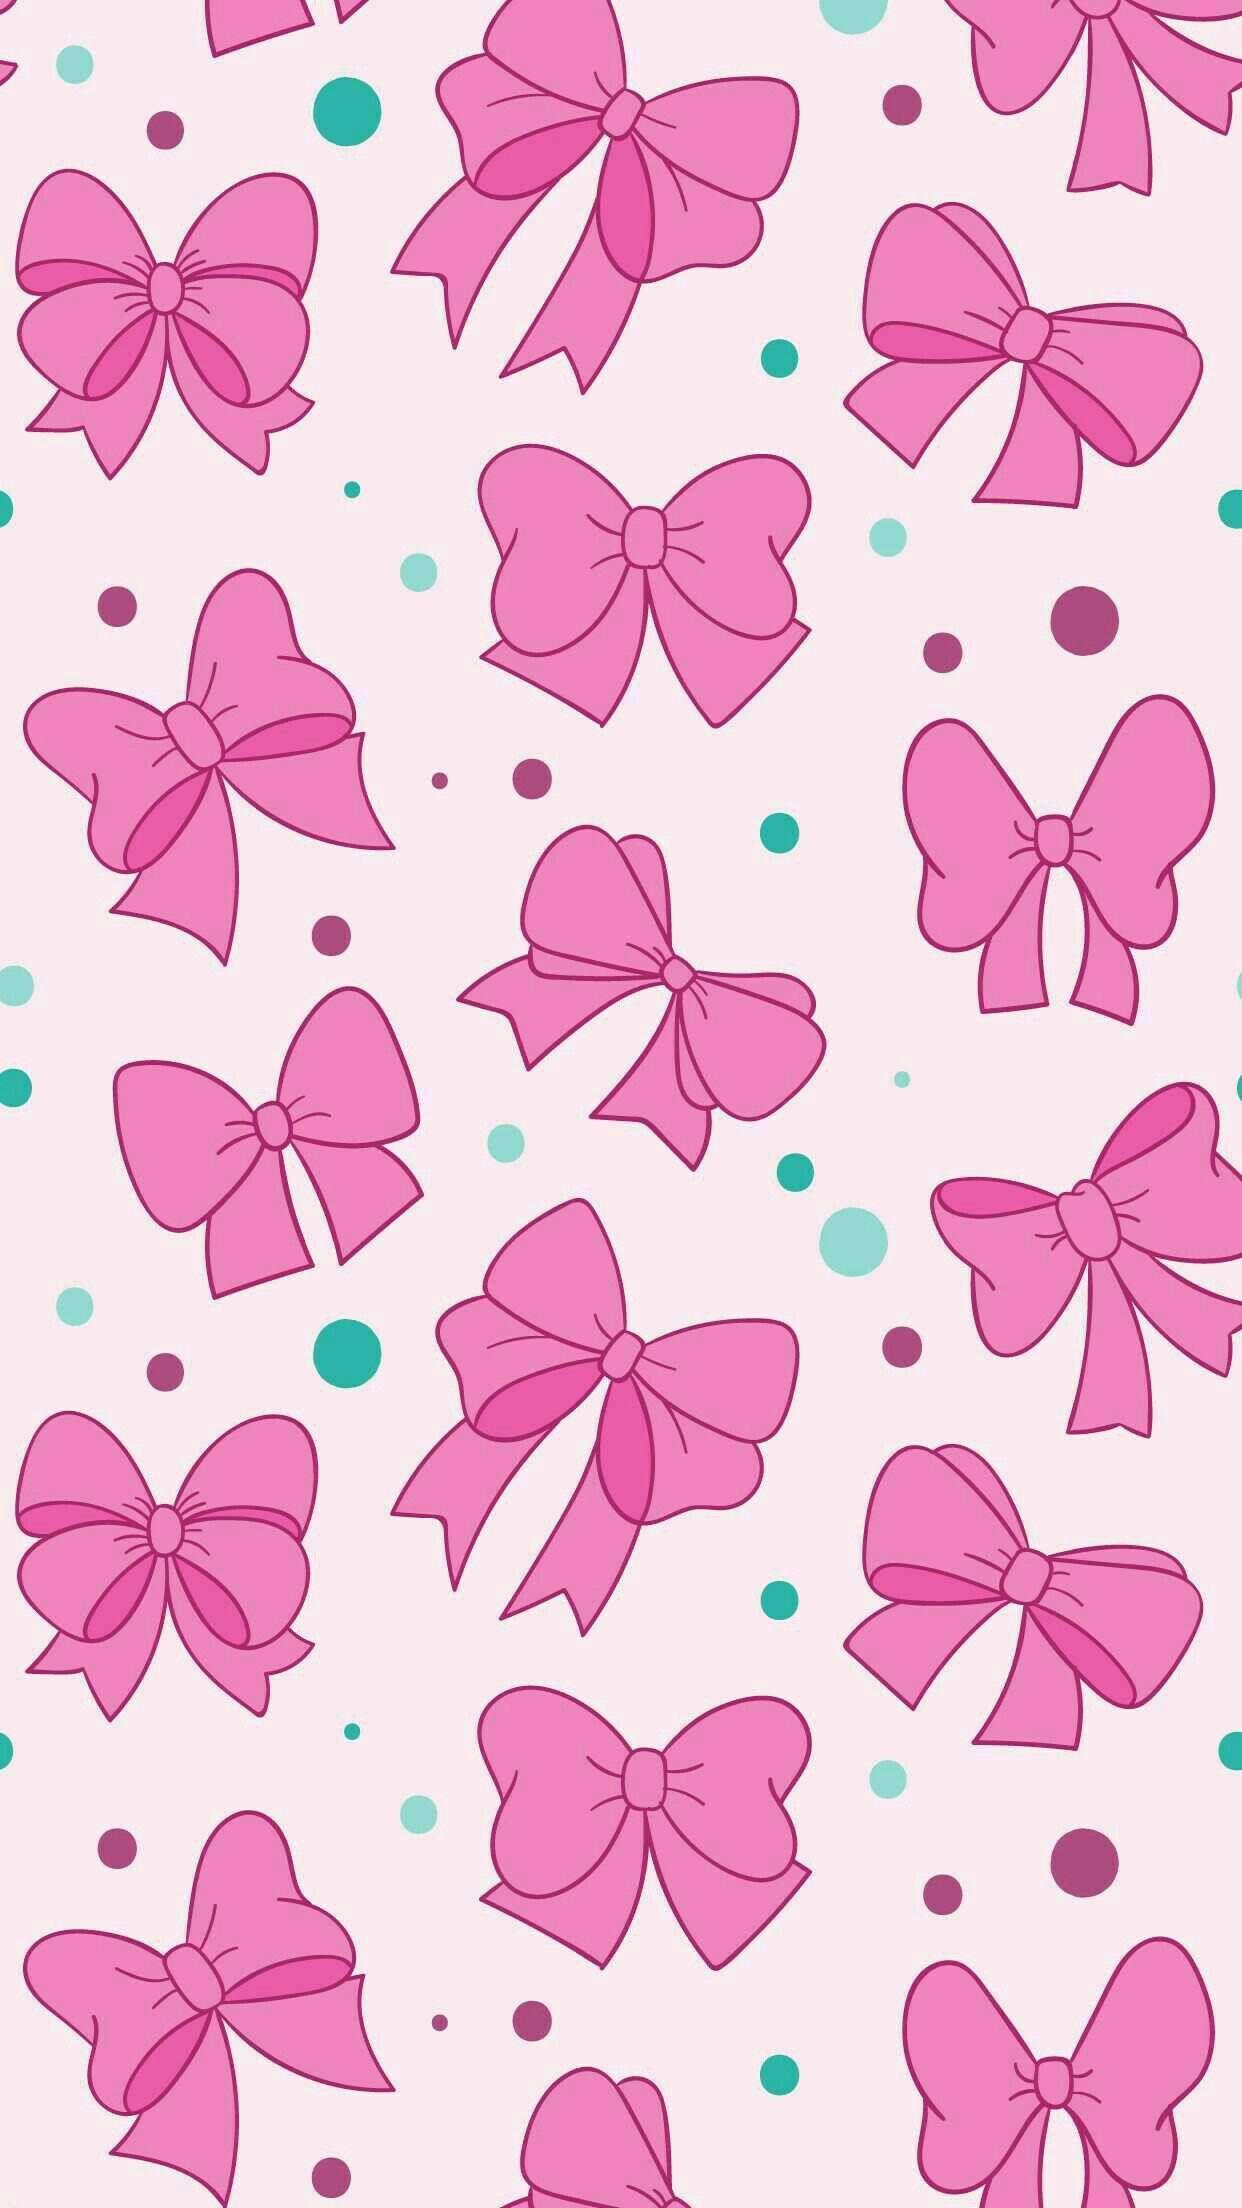 Bows And Polka Dots Girly Pink And Green Print Pattern Bow Wallpaper Bow Wallpaper Iphone Iphone Wallpaper